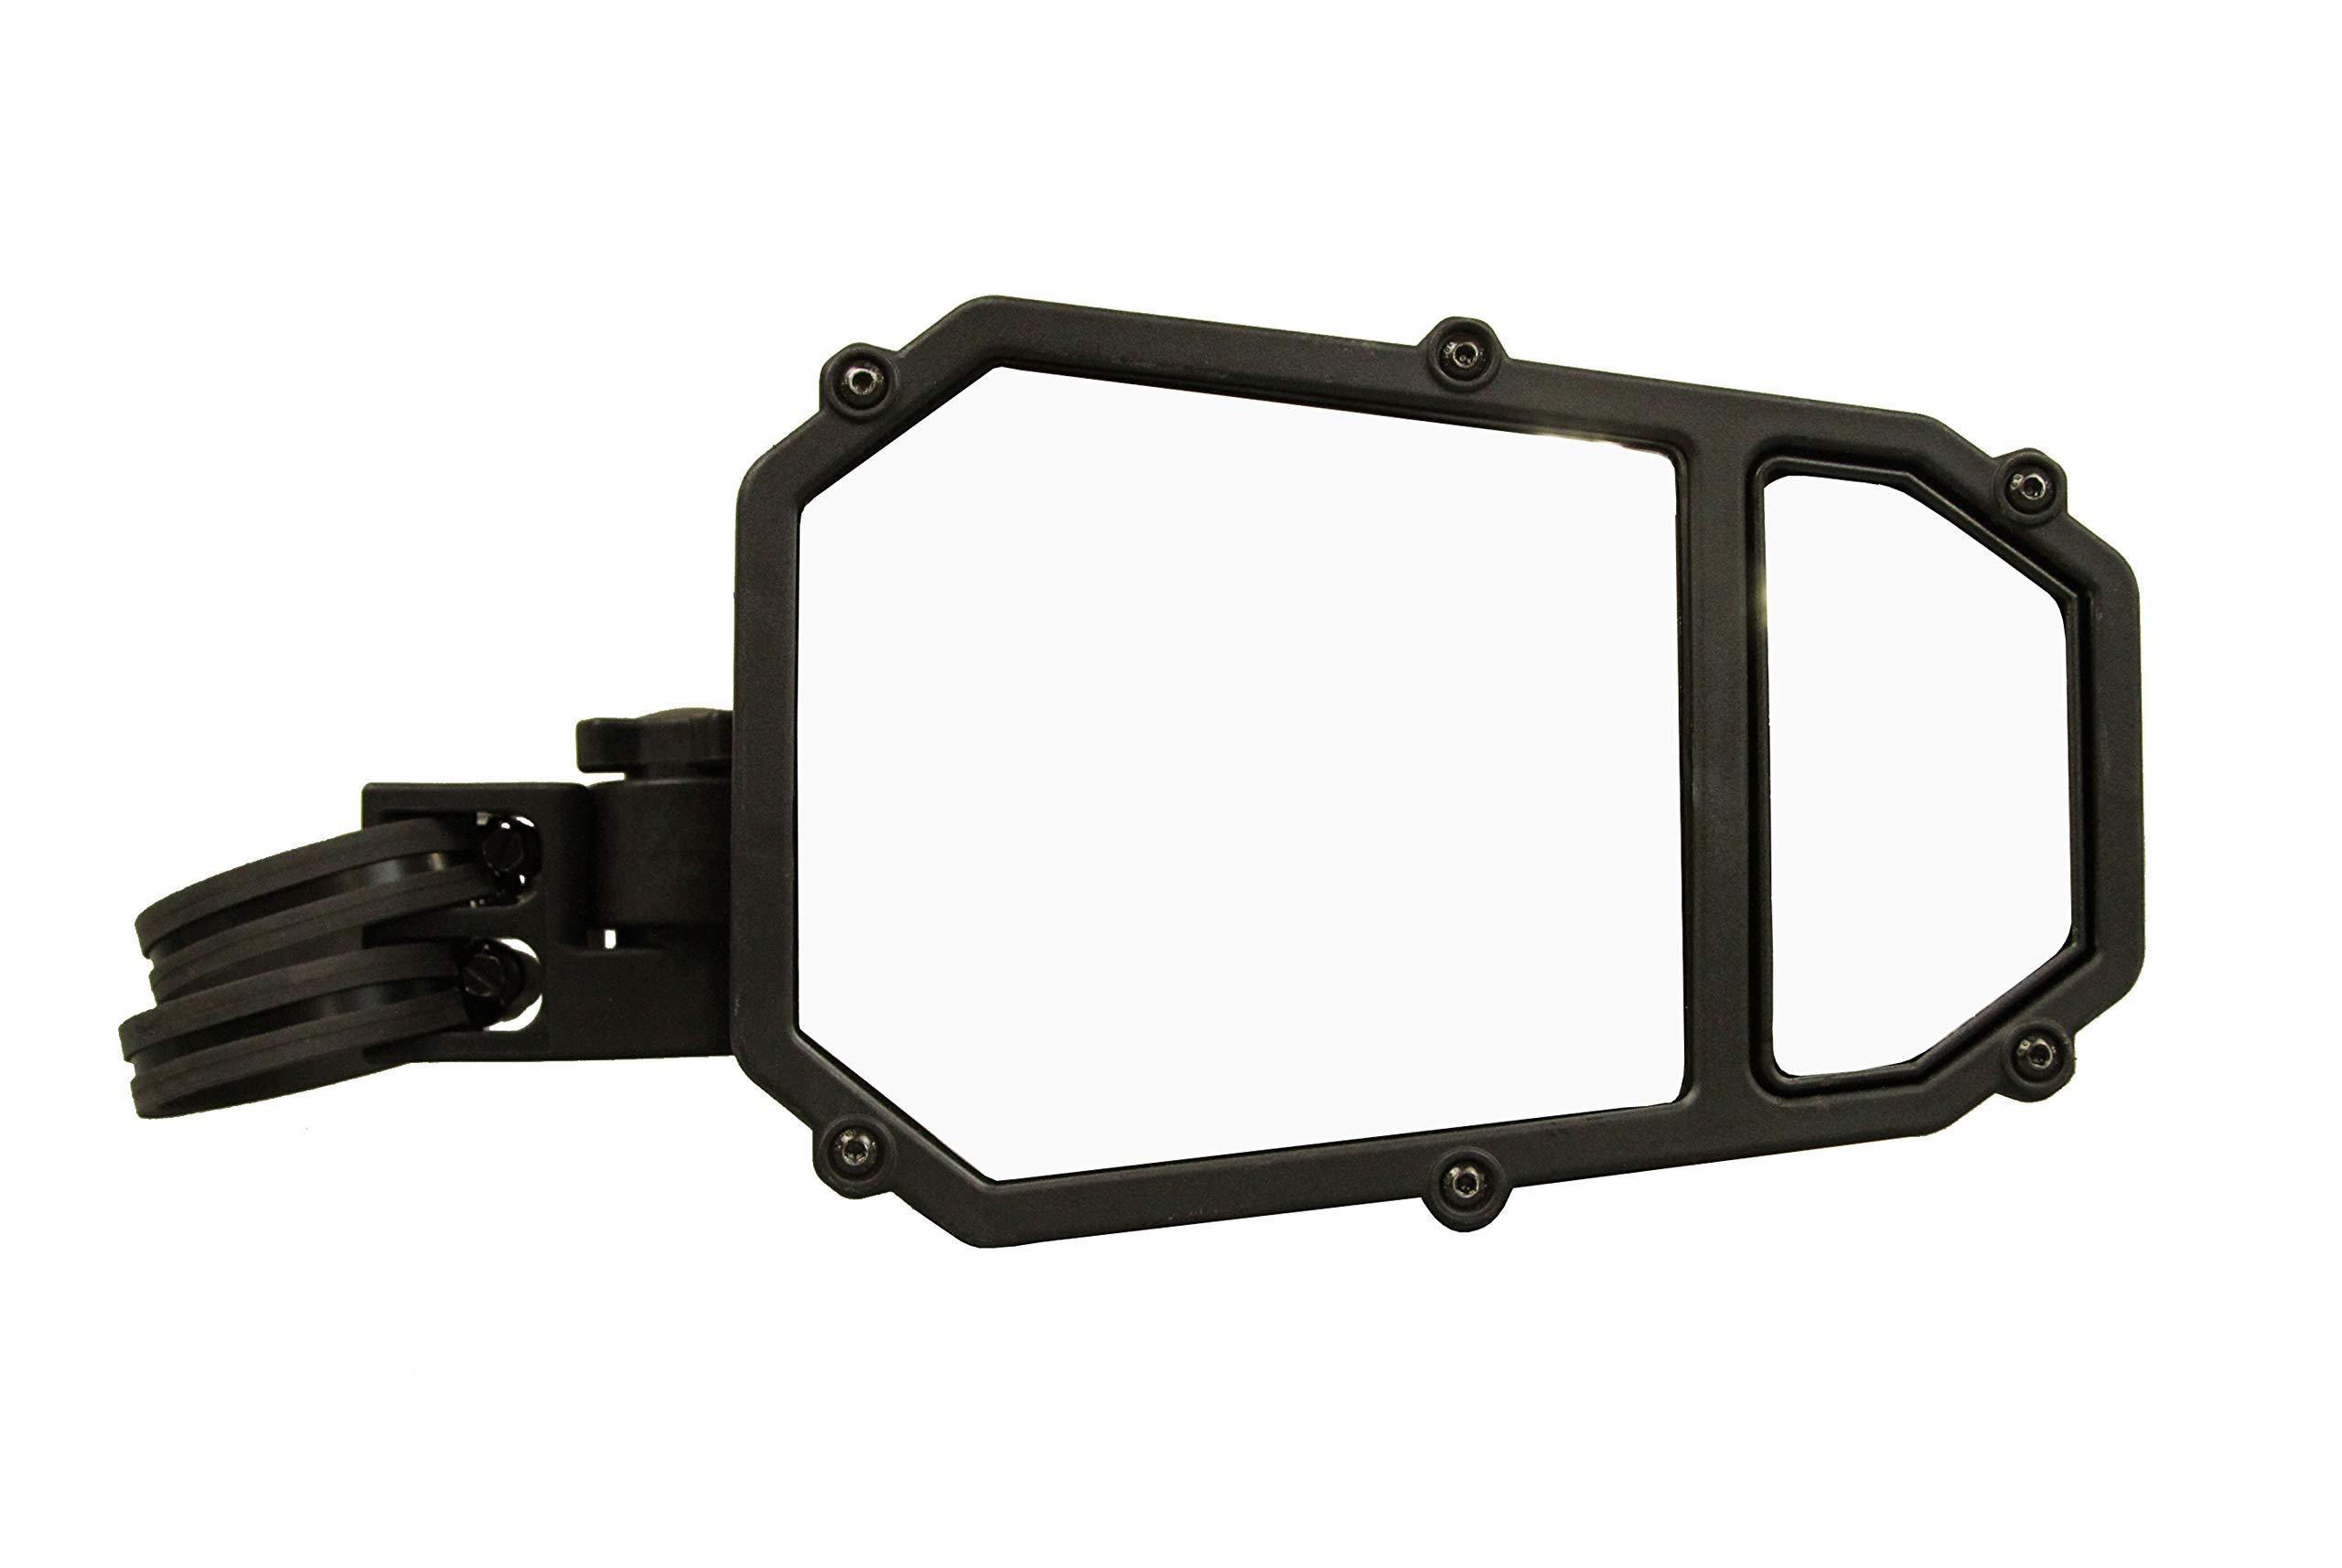 ATV TEK, UTVMIR-ES2, Elite Series UTV Side Mirror w/ Blindspot Technology & Dual Axis Breakaway - Fits ATVs and UTVs Compatible to Elite Series Adapter